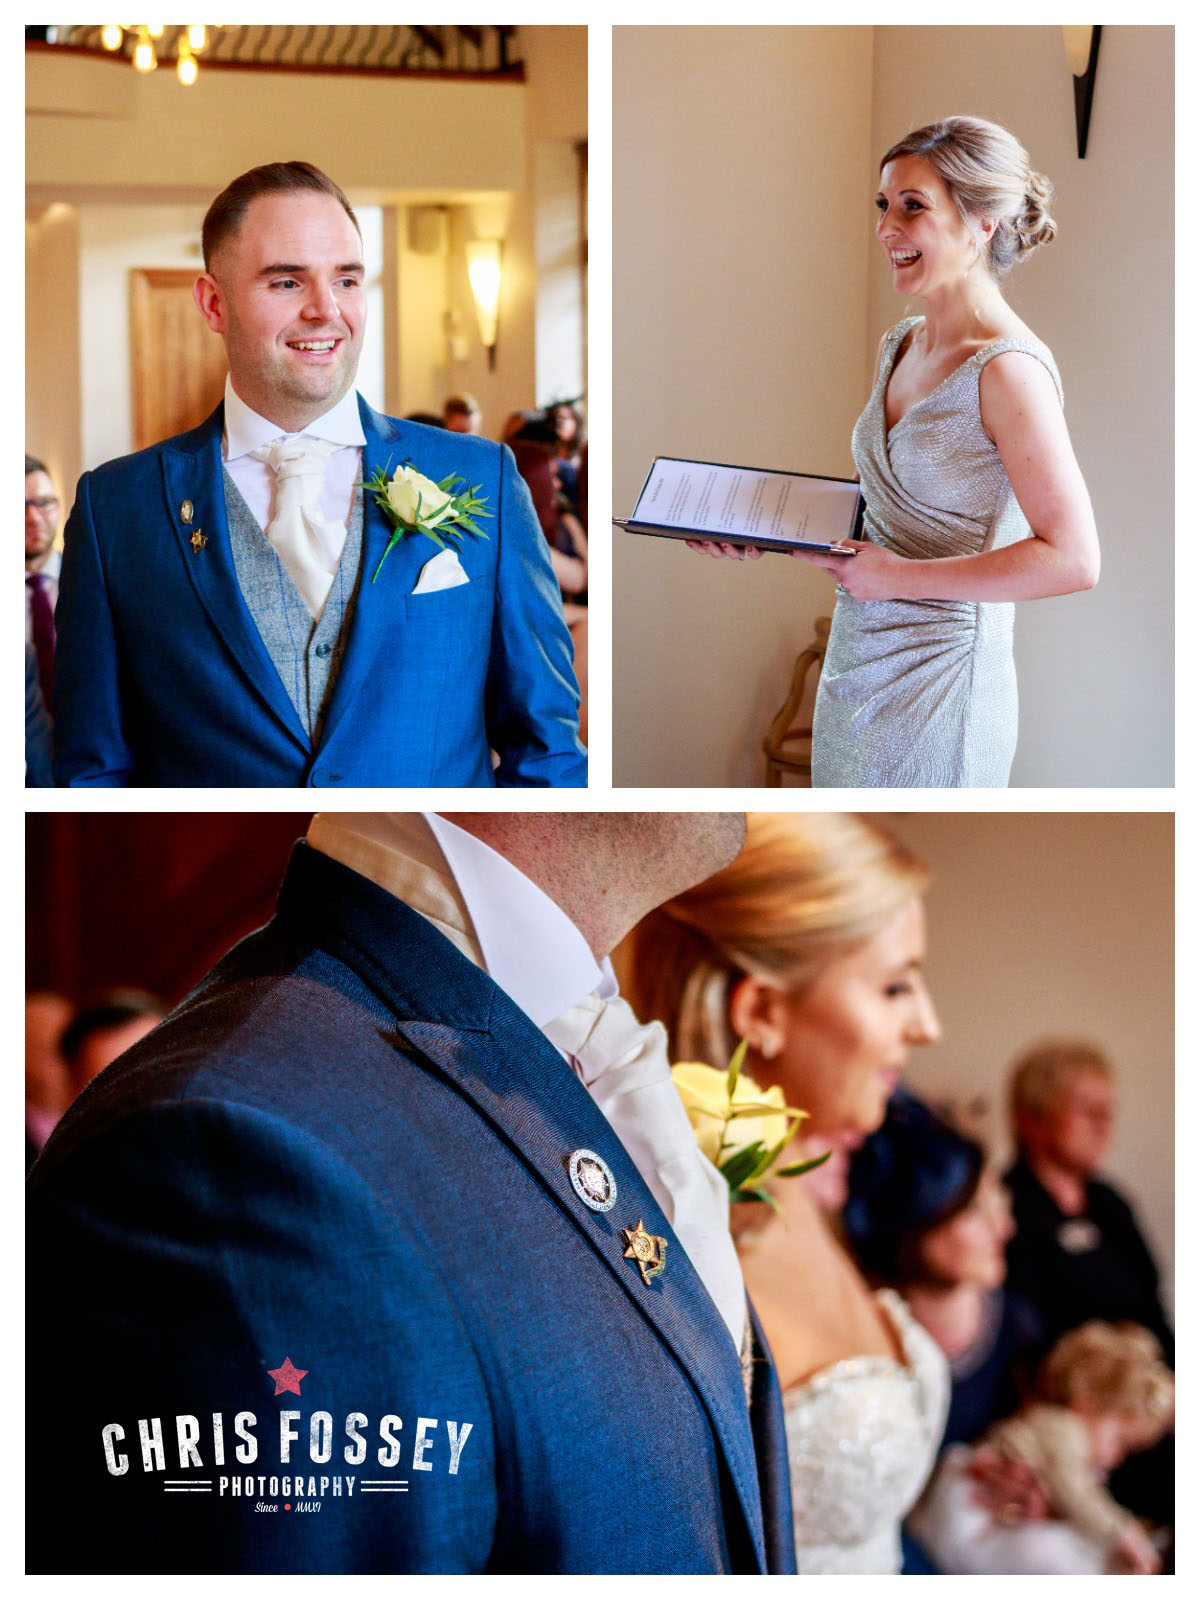 Nuthurst Grange Hotel Gorgeous Natural Wedding Photography Warwickshire Chris Fossey B94 5NL 06